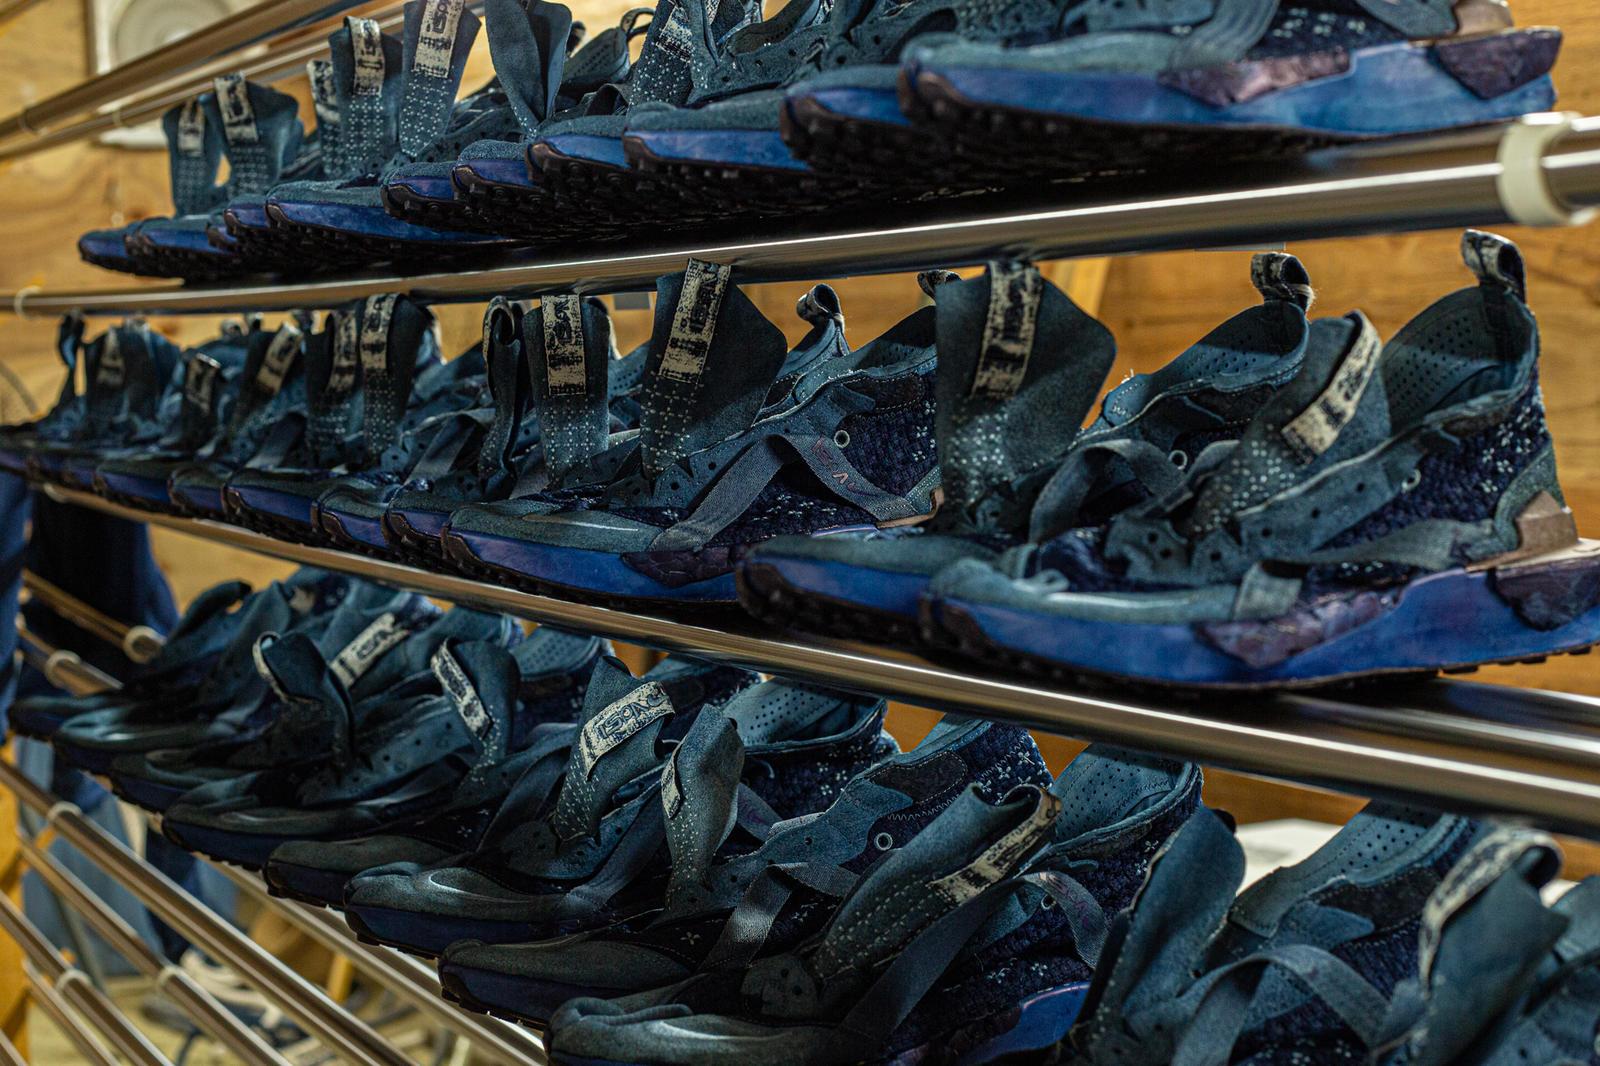 Nike ISPA ドリフターに新シルエット 藍染の日本限定モデルも発売